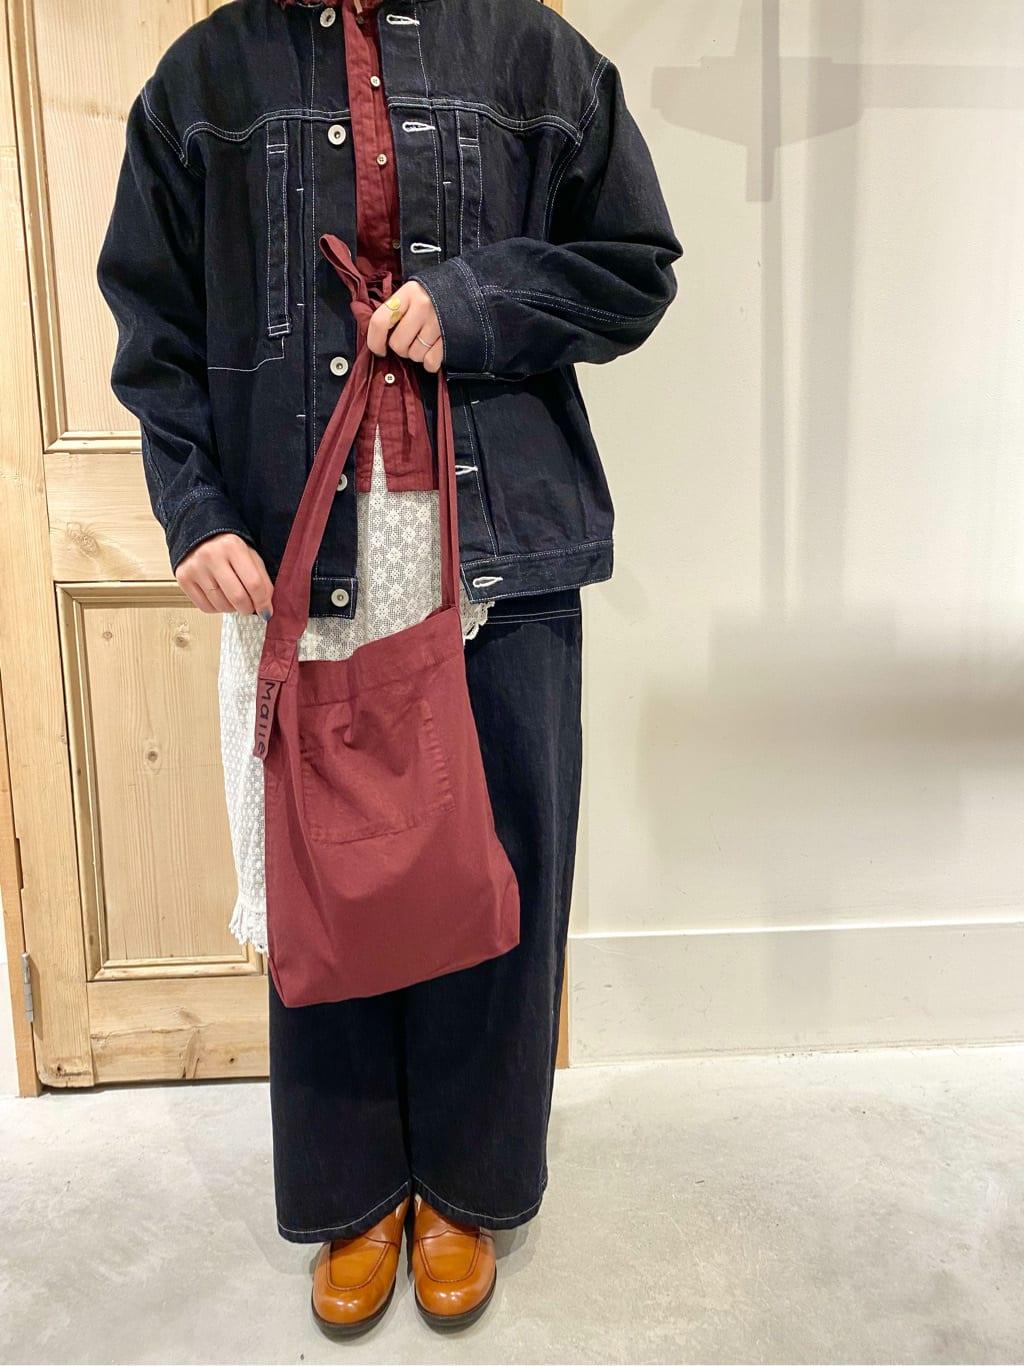 Malle chambre de charme 調布パルコ 身長:160cm 2021.09.14